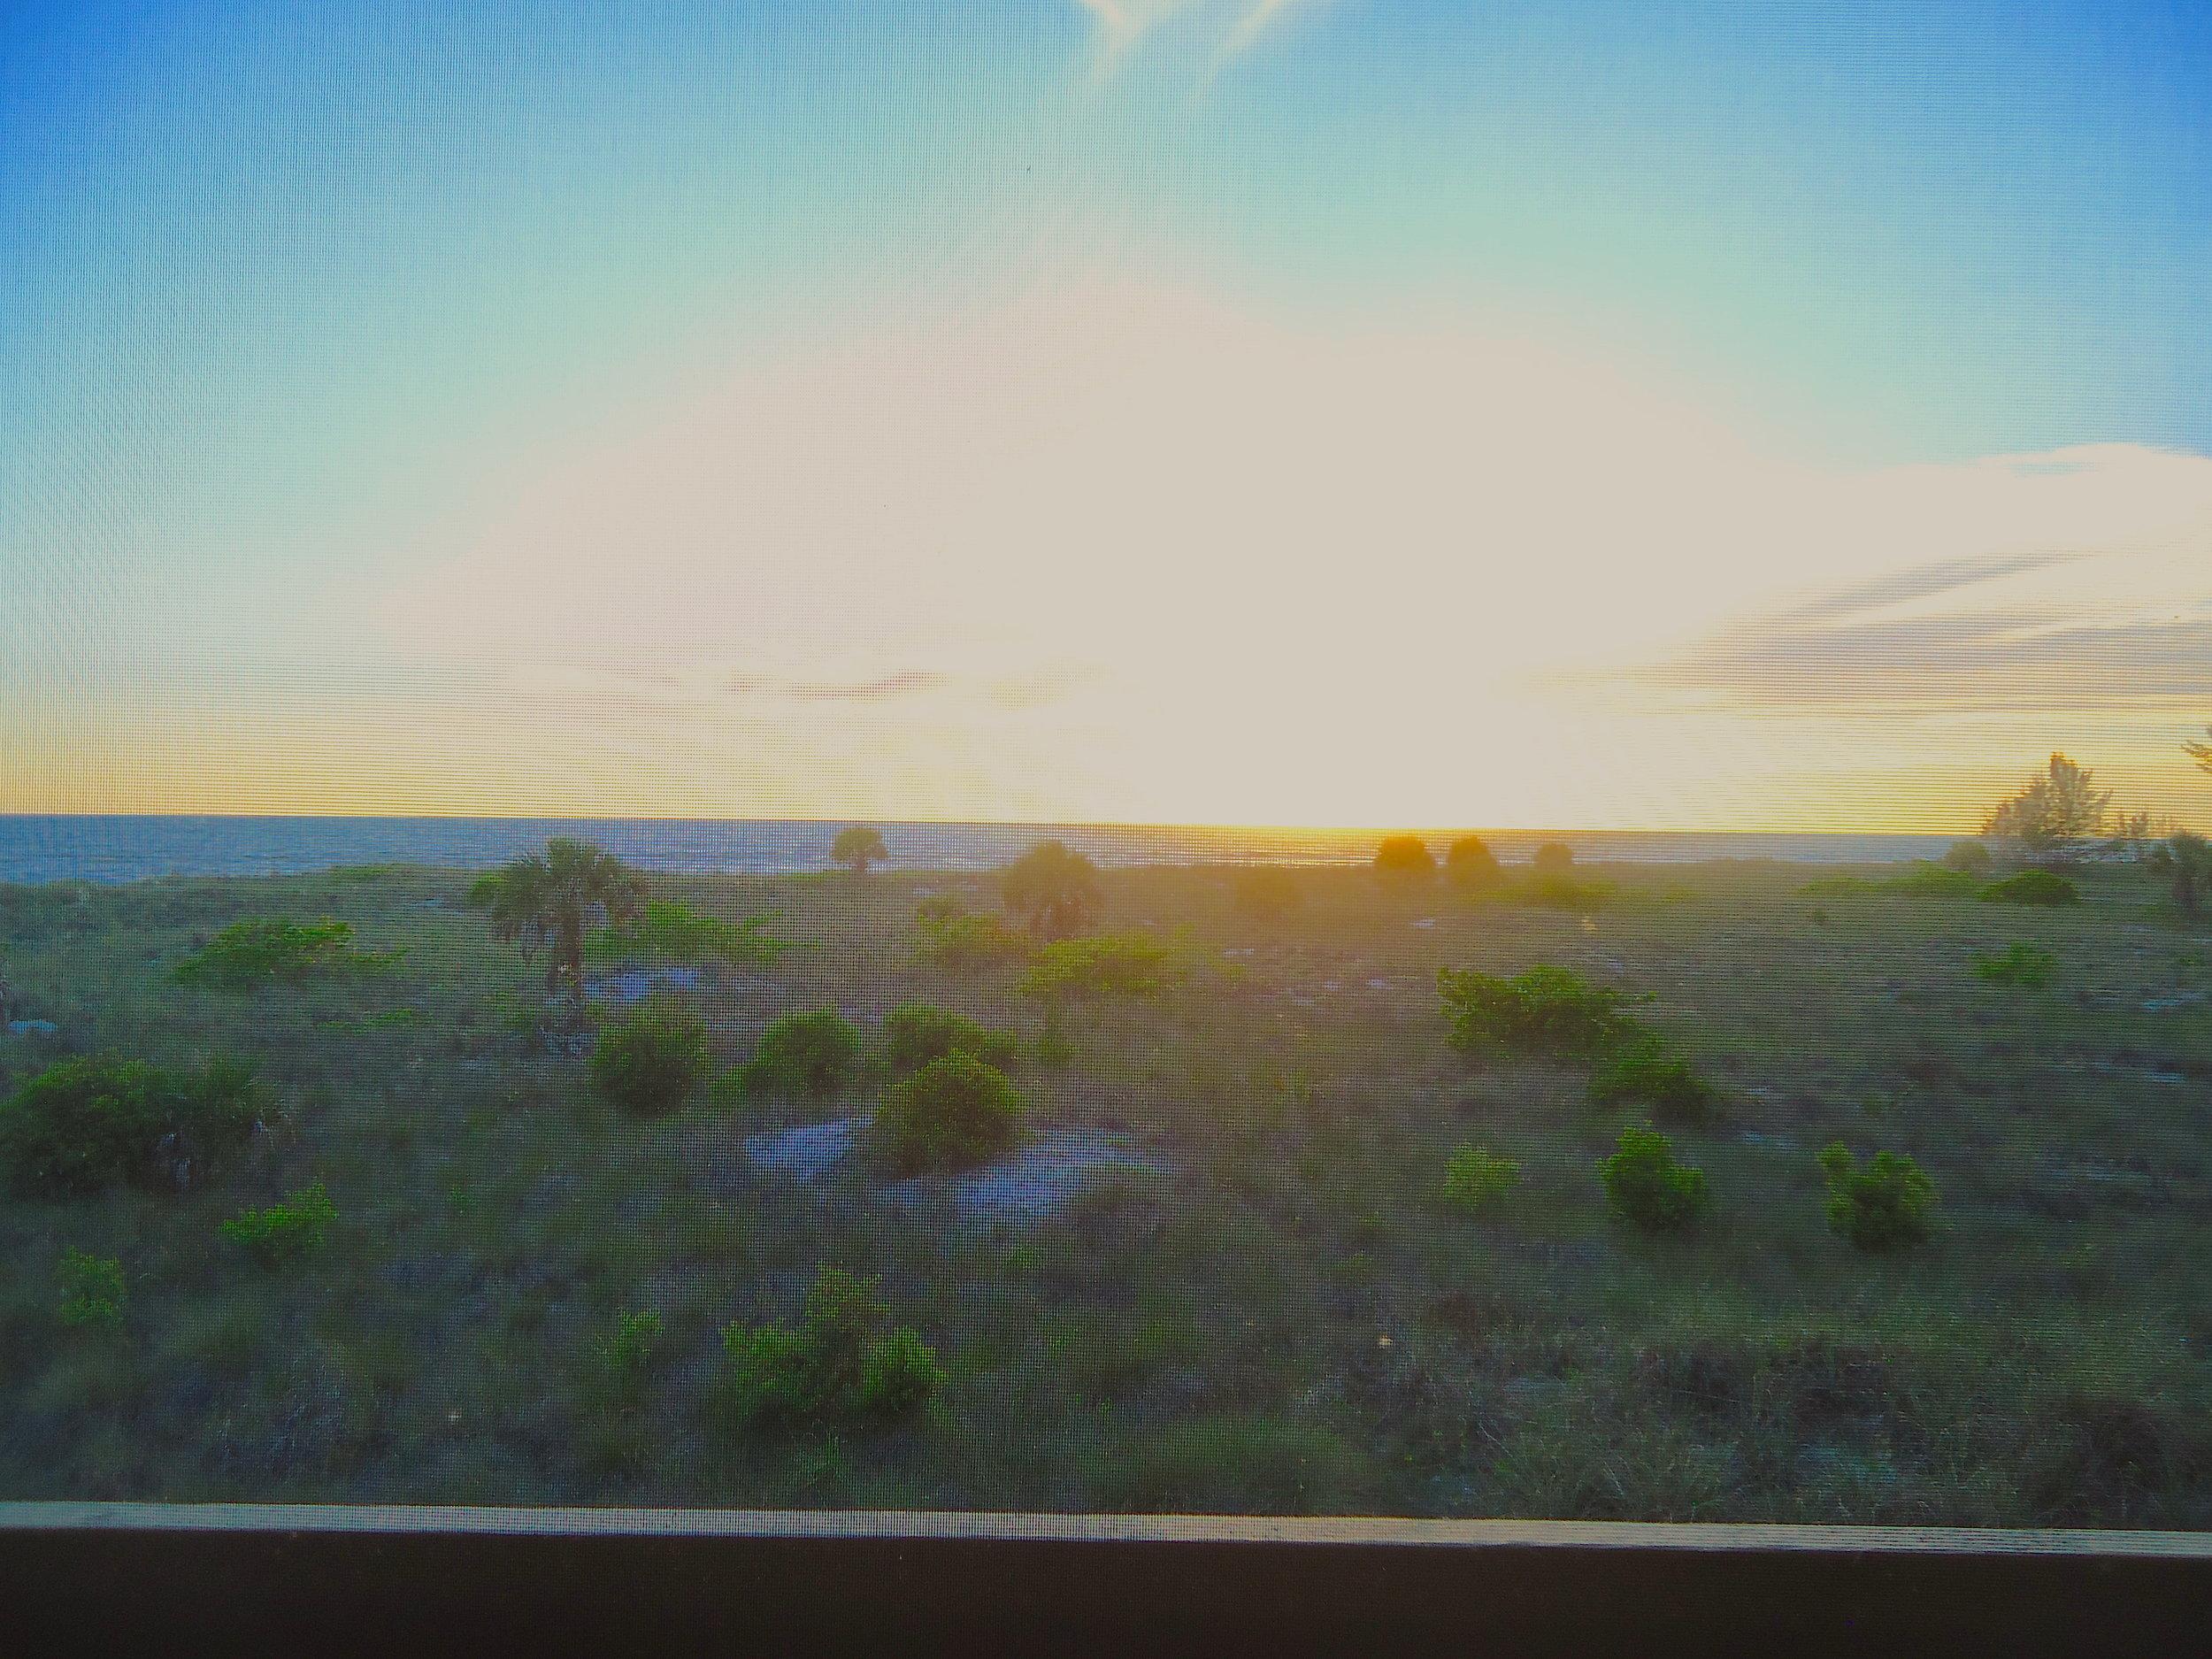 sunset 103b.jpg